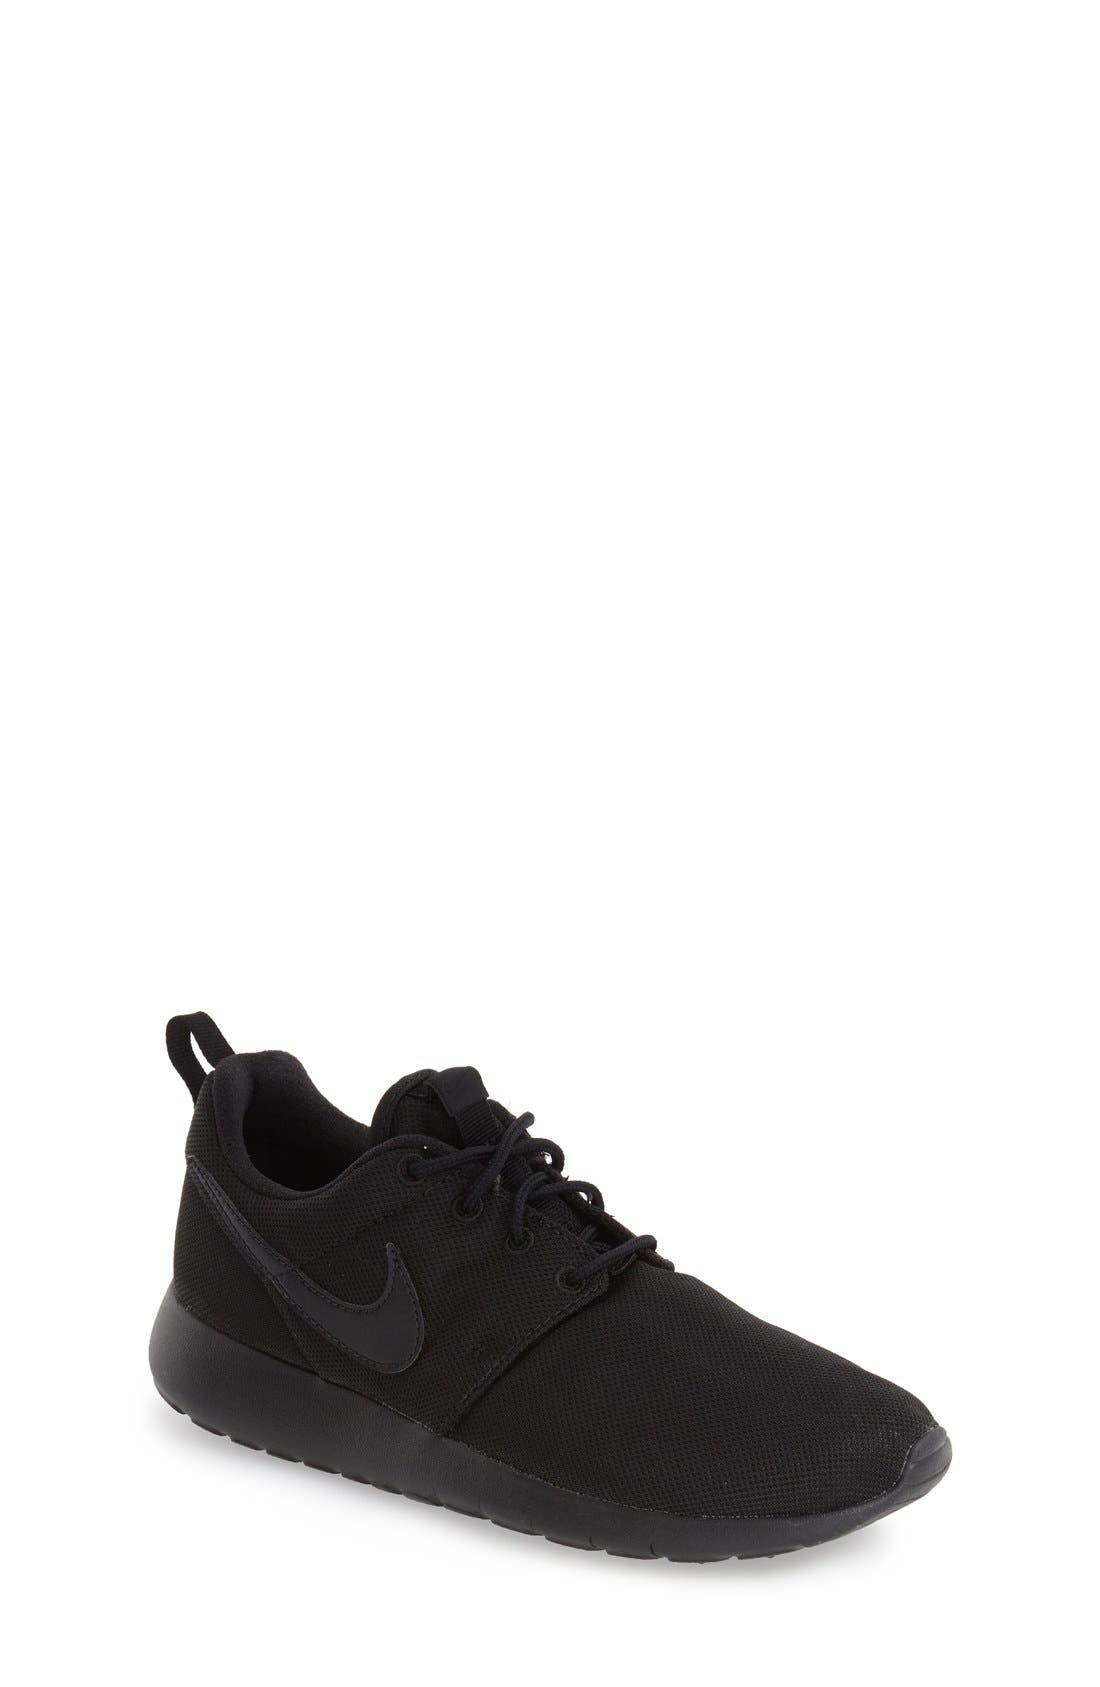 Main Image - Nike 'Roshe Run' Sneaker (Little Kid & Big Kid)